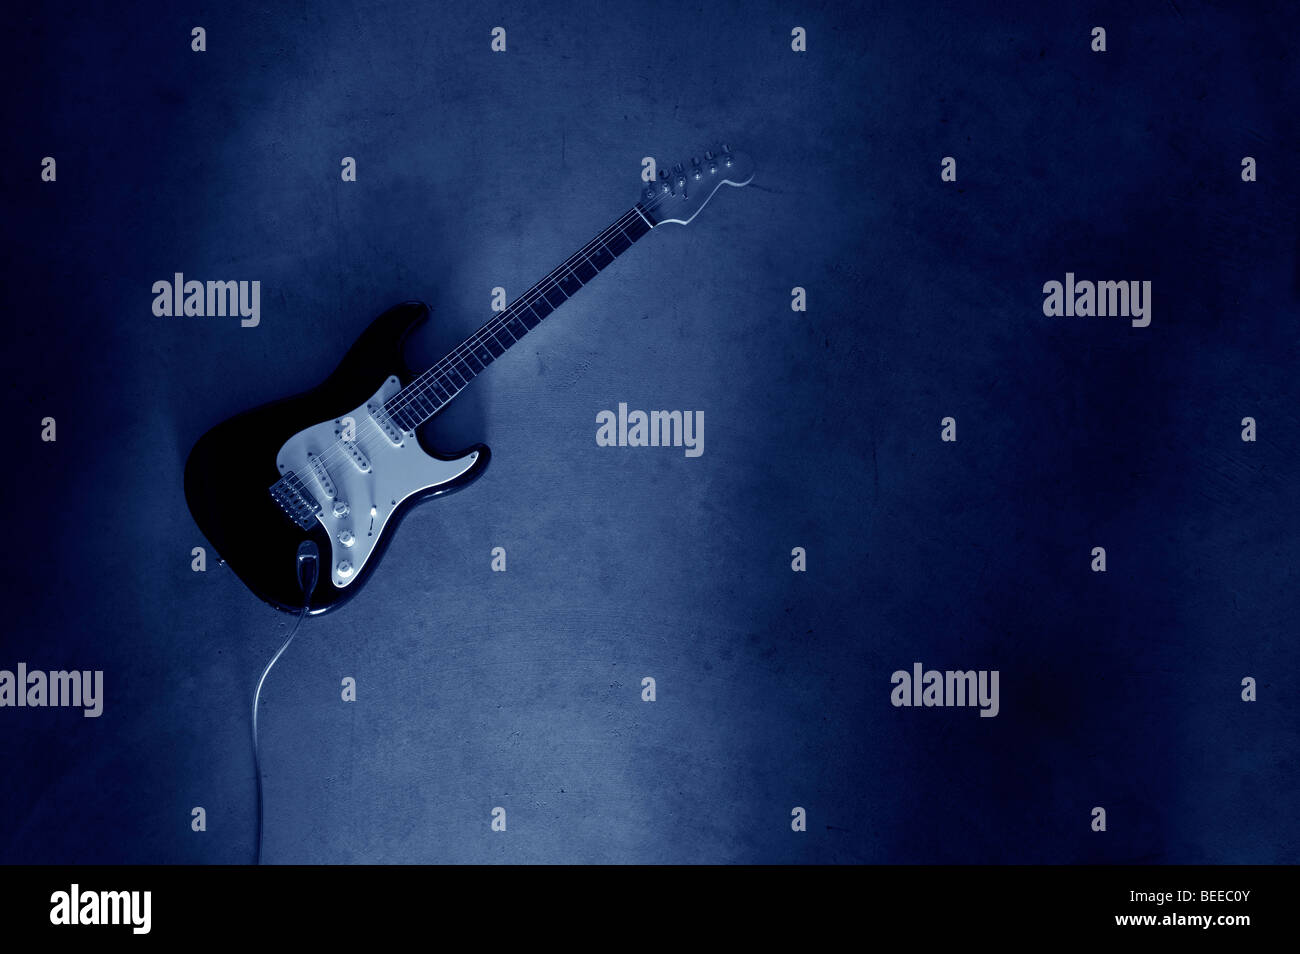 Electric guitar - Stock Image